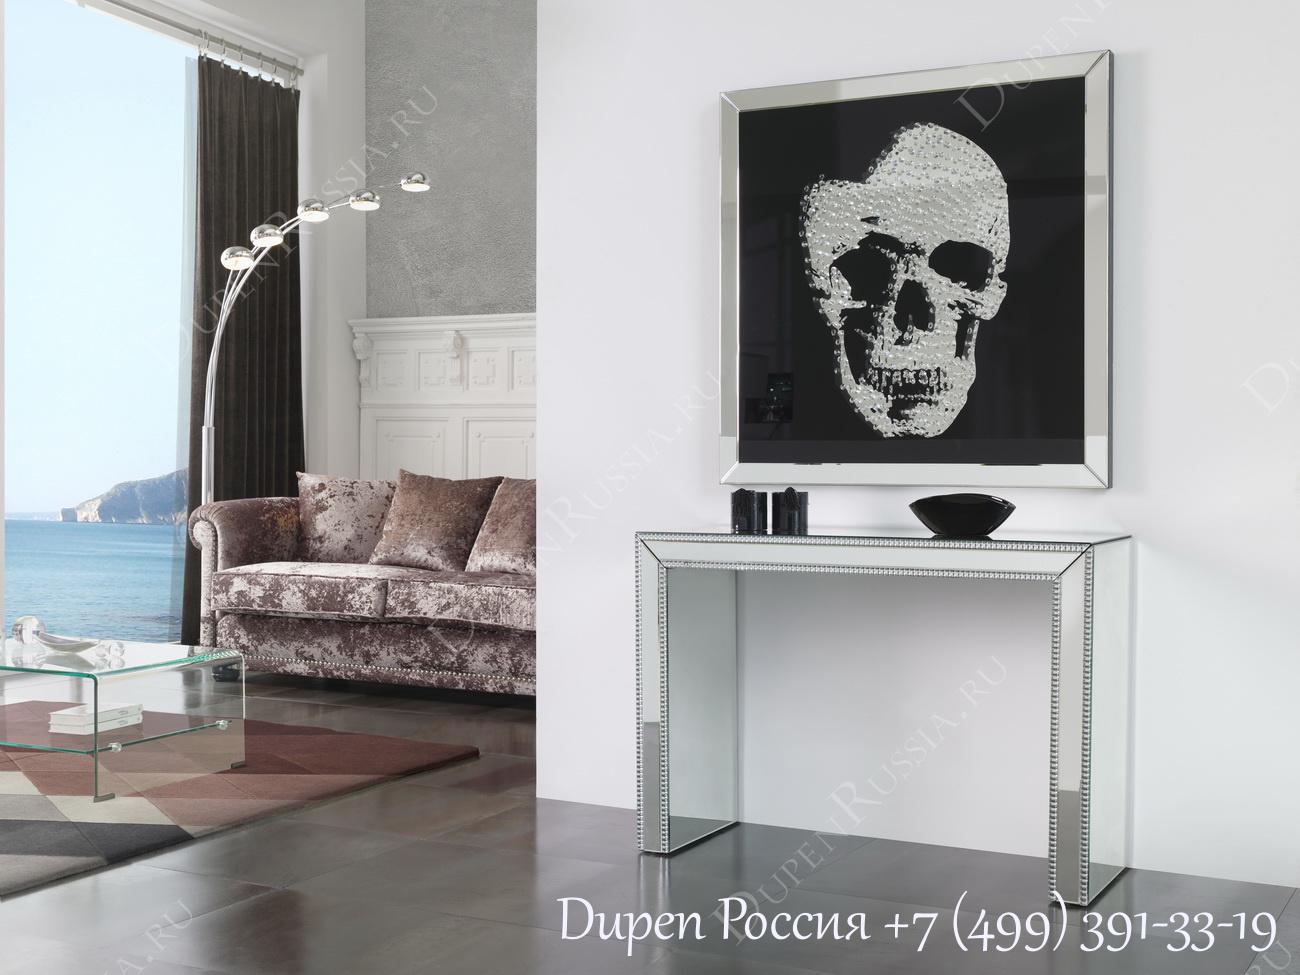 Зеркало DUPEN E-121, Консоль DUPEN CON-09 стекло-зеркало